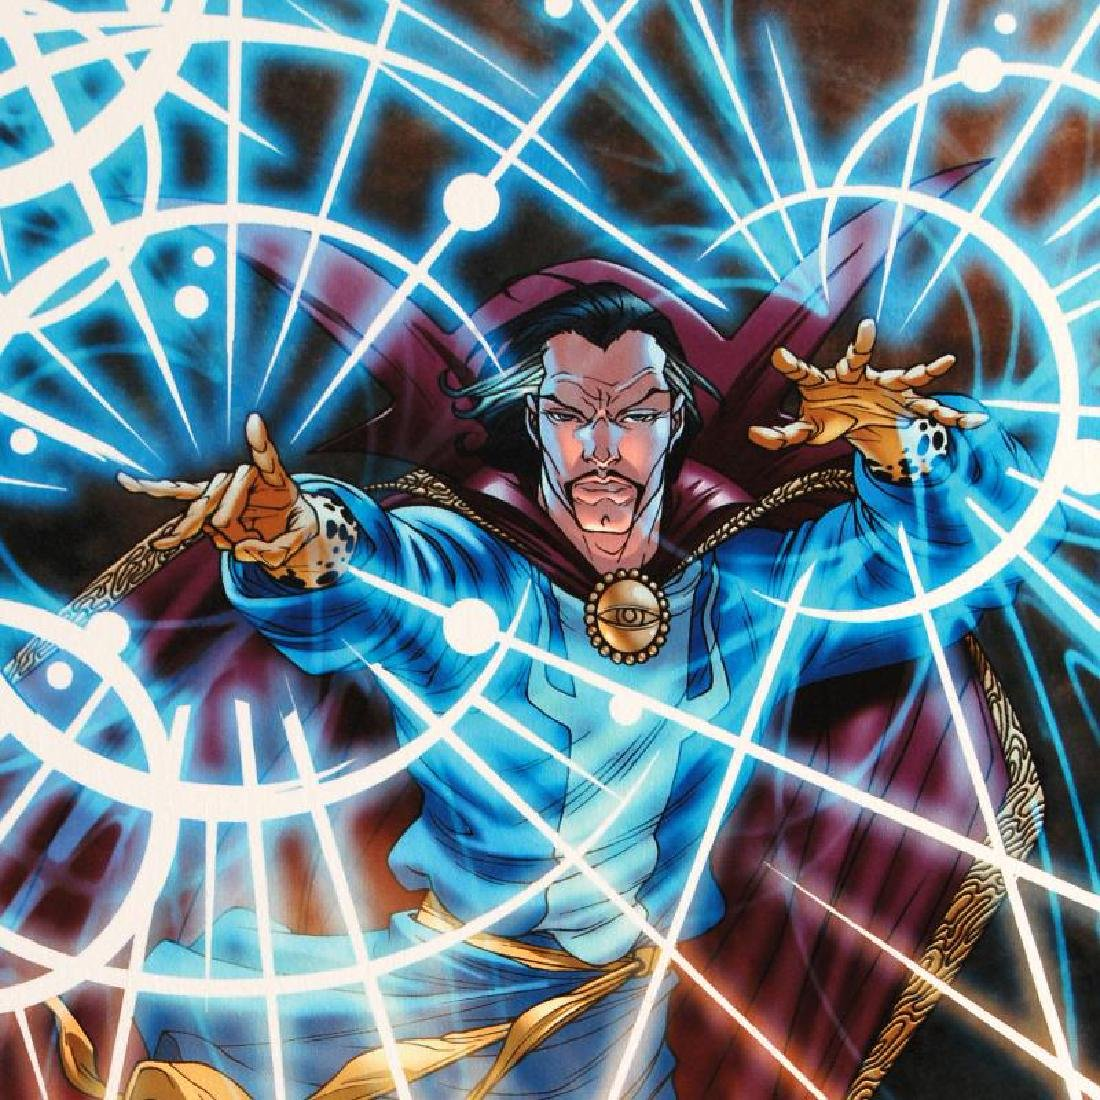 Marvel Adventures: Super Heroes #5 by Marvel Comics - 2